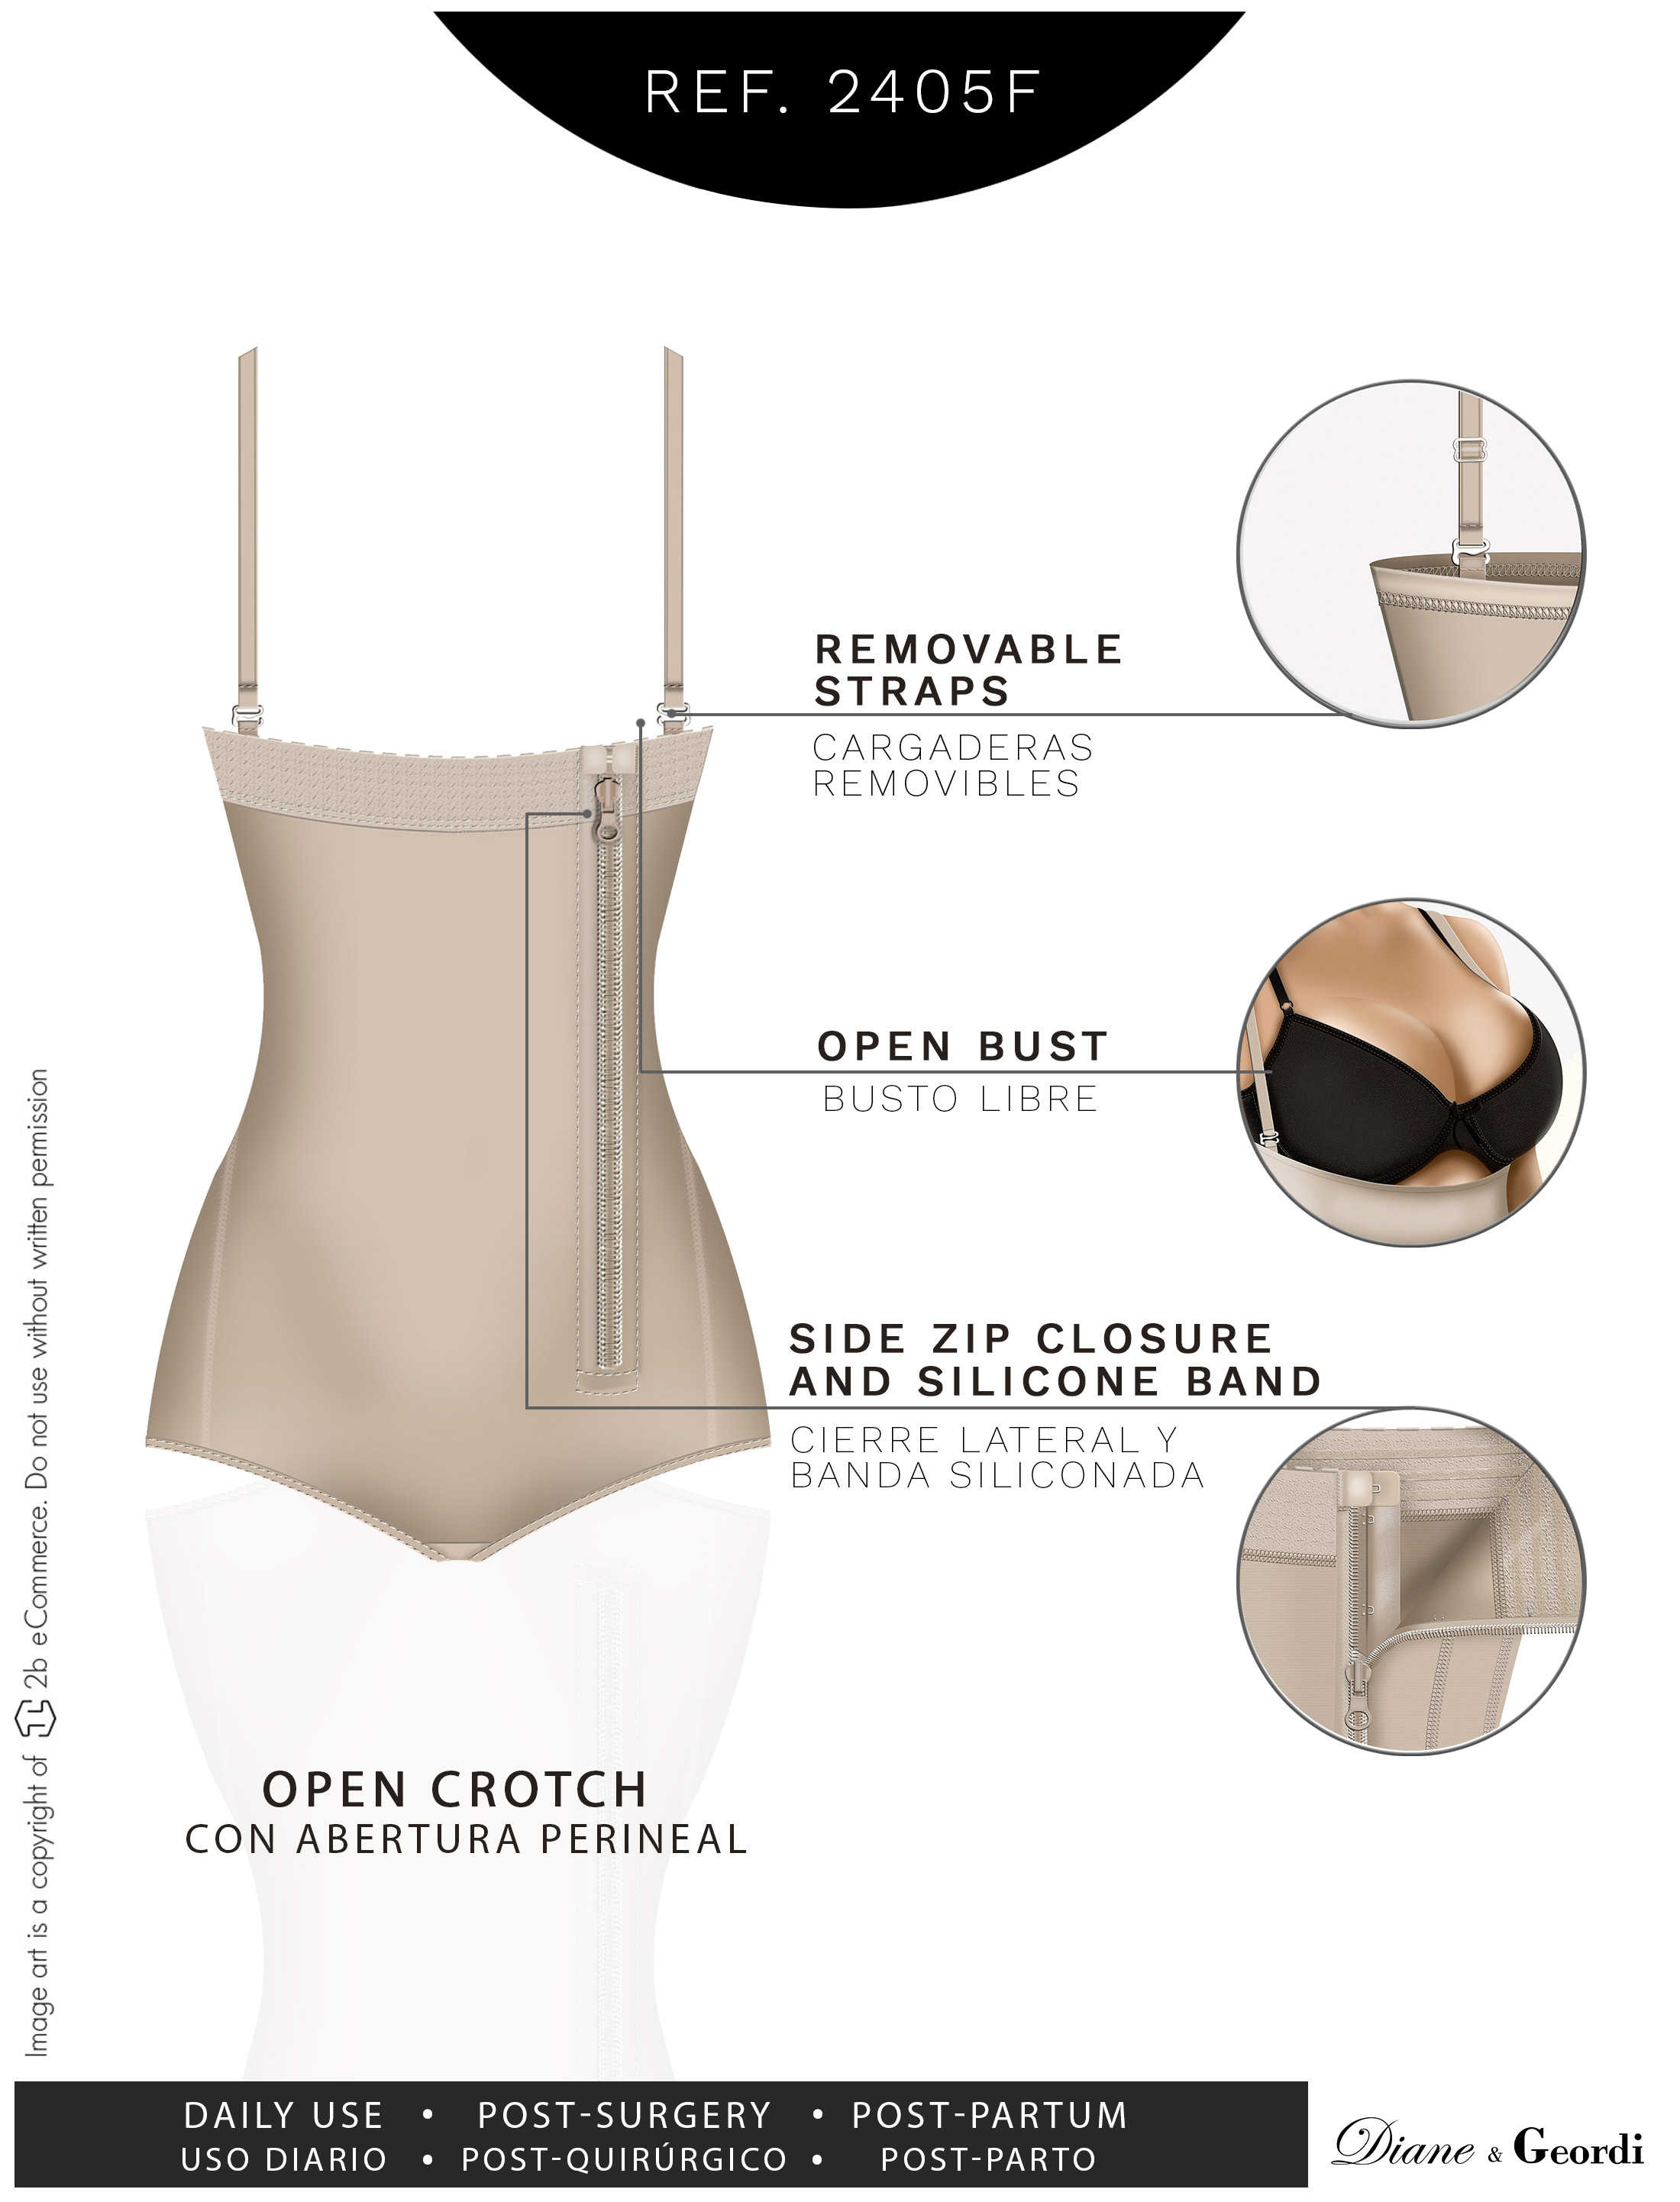 f6c258352e7 Diane   Geordi - Diane   Geordi 2405F Strapless Waist Shaper For Women  Fajas Colombianas - Walmart.com